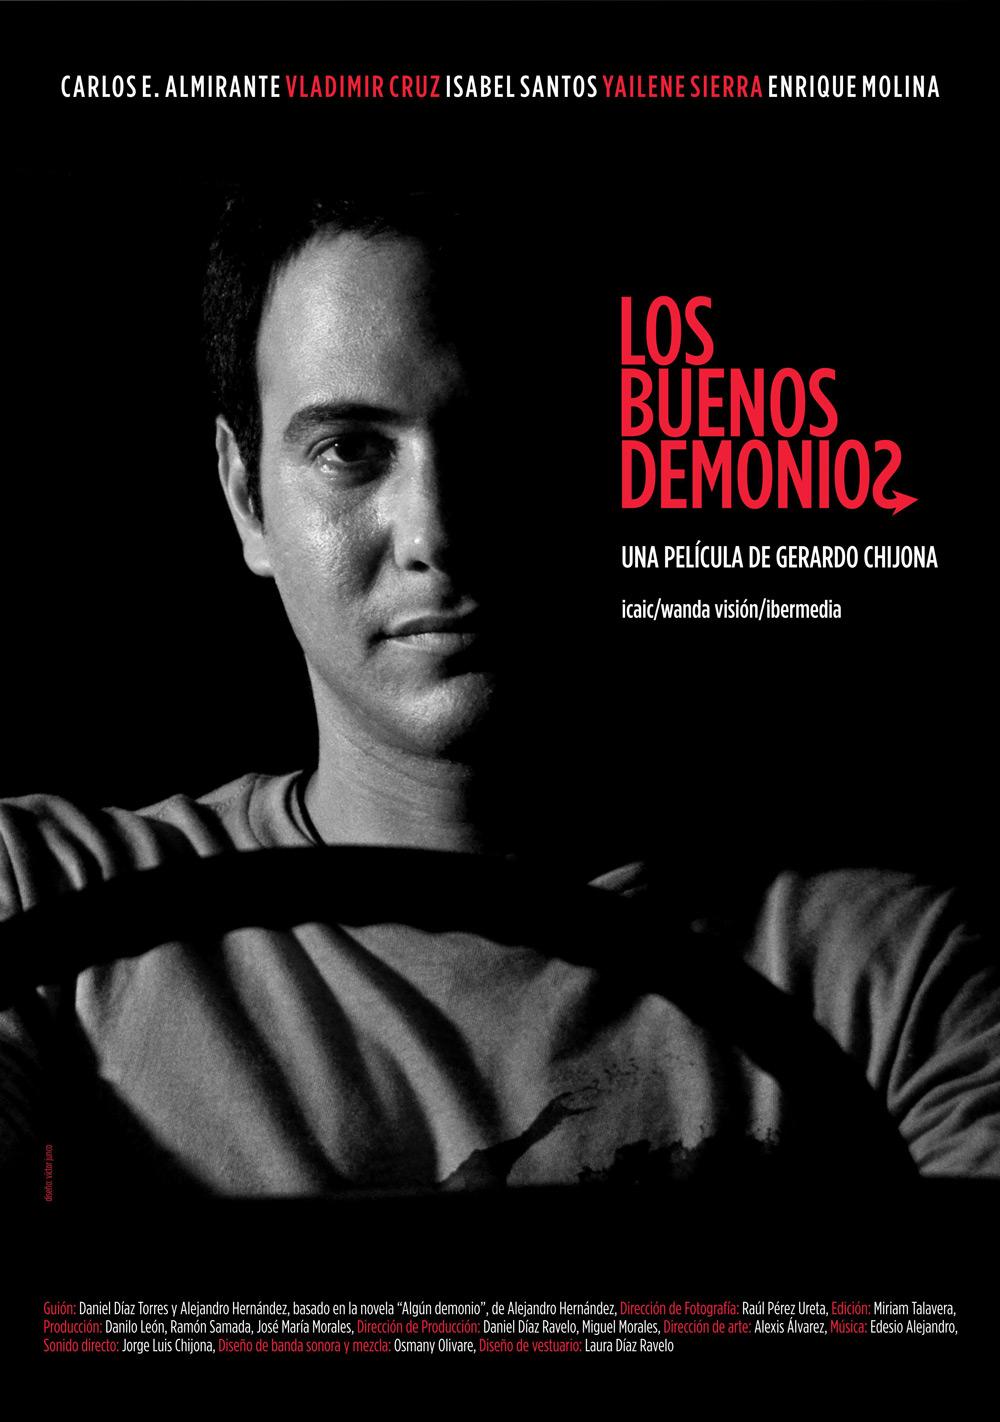 https://www.gerardochijona.com/wp-content/uploads/2018/07/Poster-los-buenos-demonios-3.jpg